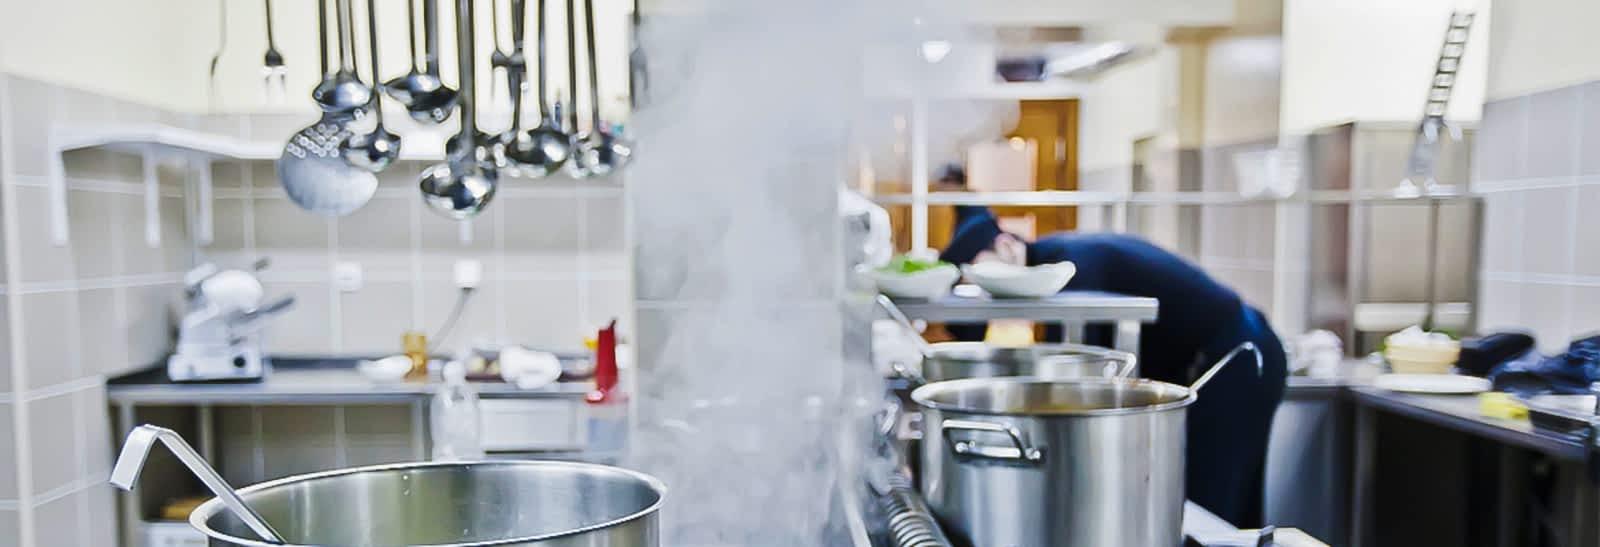 Wescor Food Equipment - Opening Hours - 11825 145 St NW, Edmonton, AB